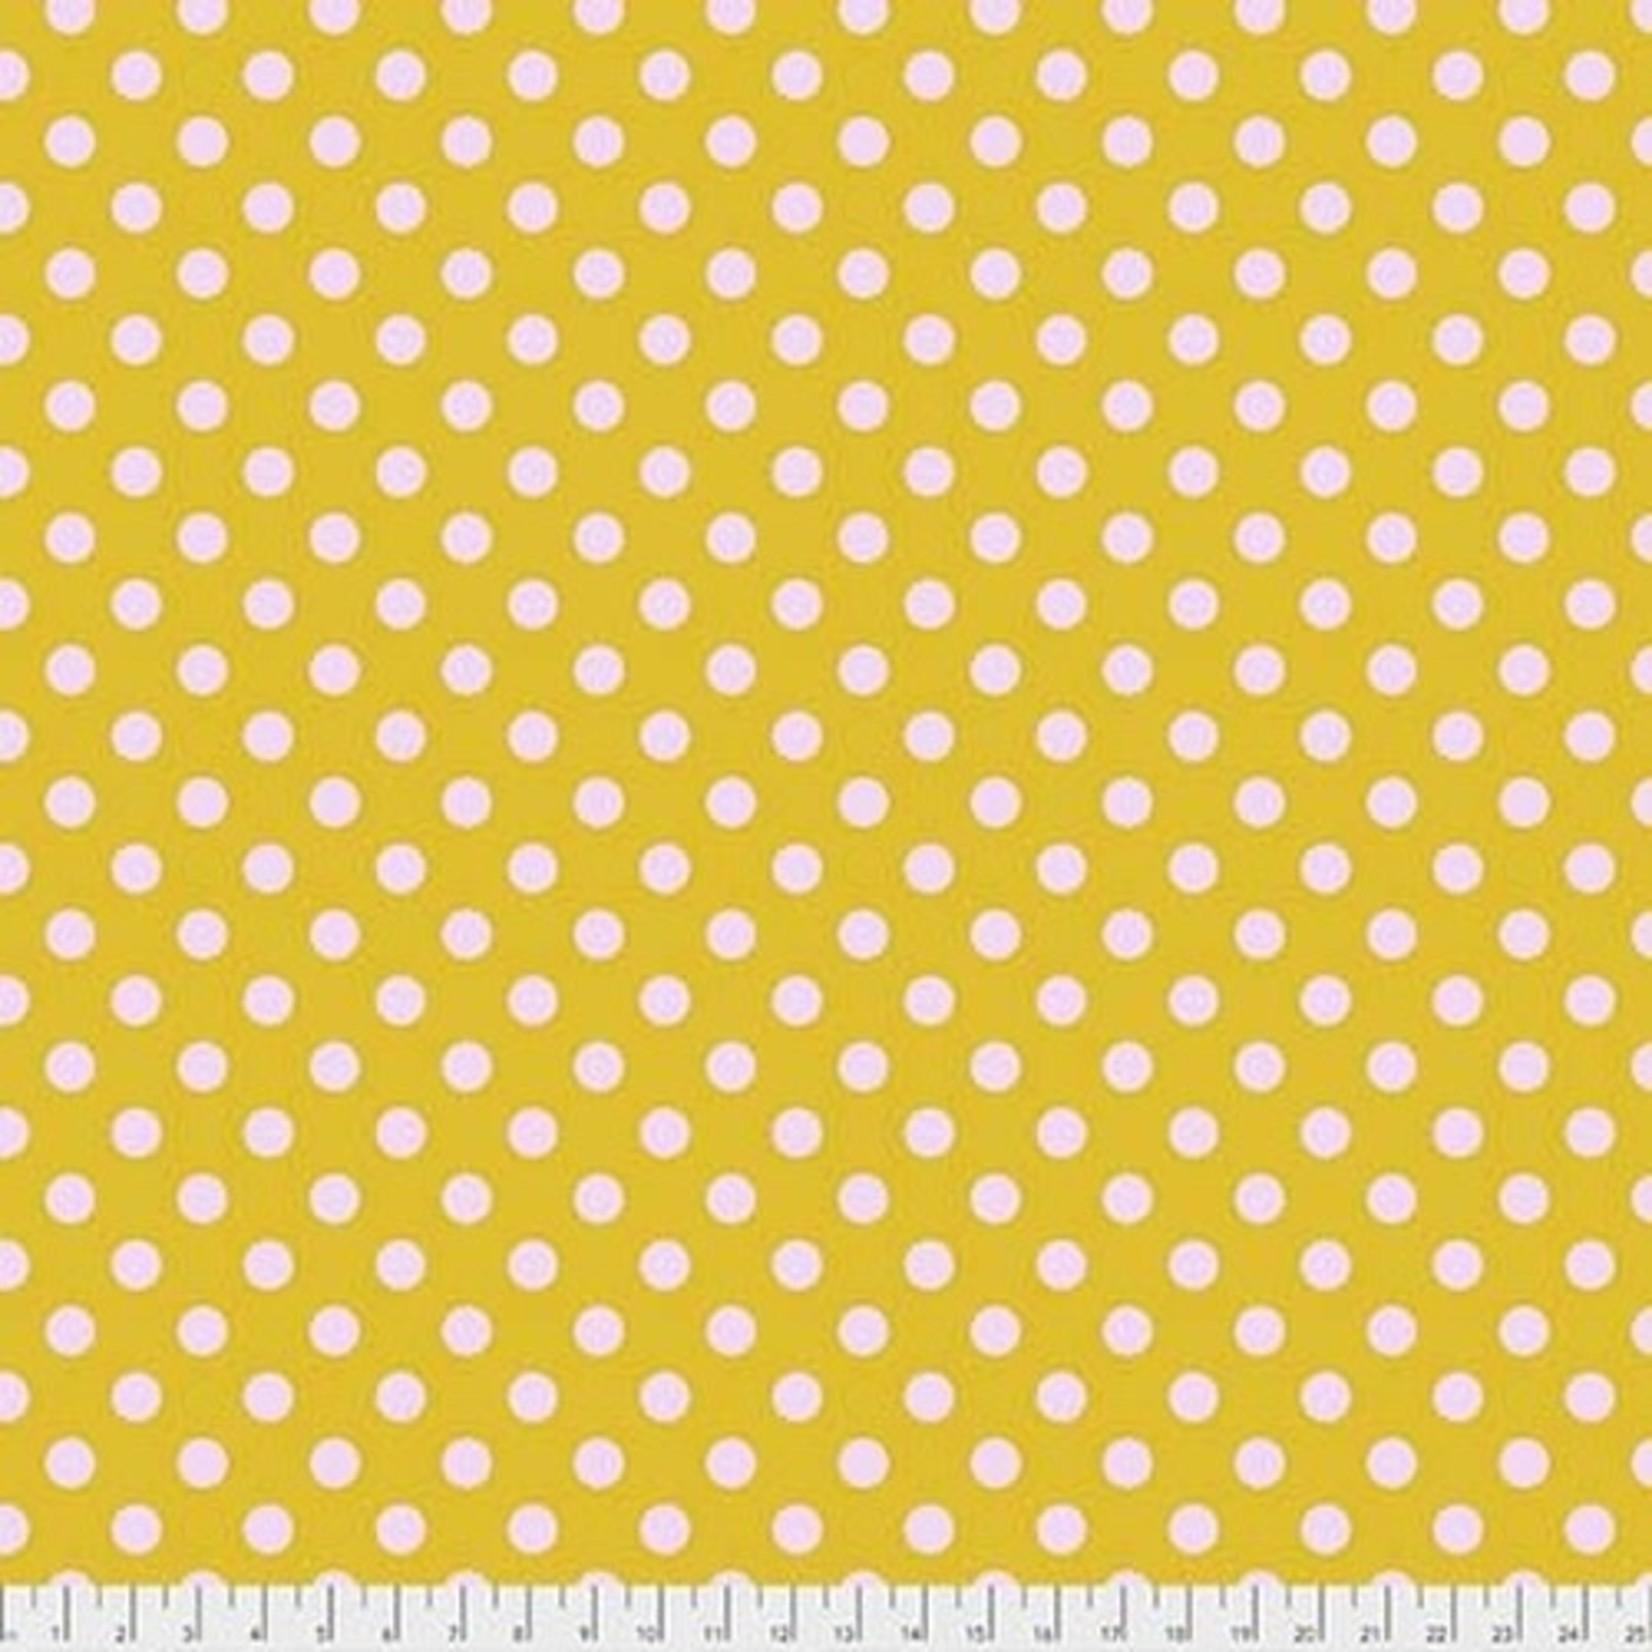 Tula Pink Tula Pom Poms- Marigold 0.17 per cm or $17/m